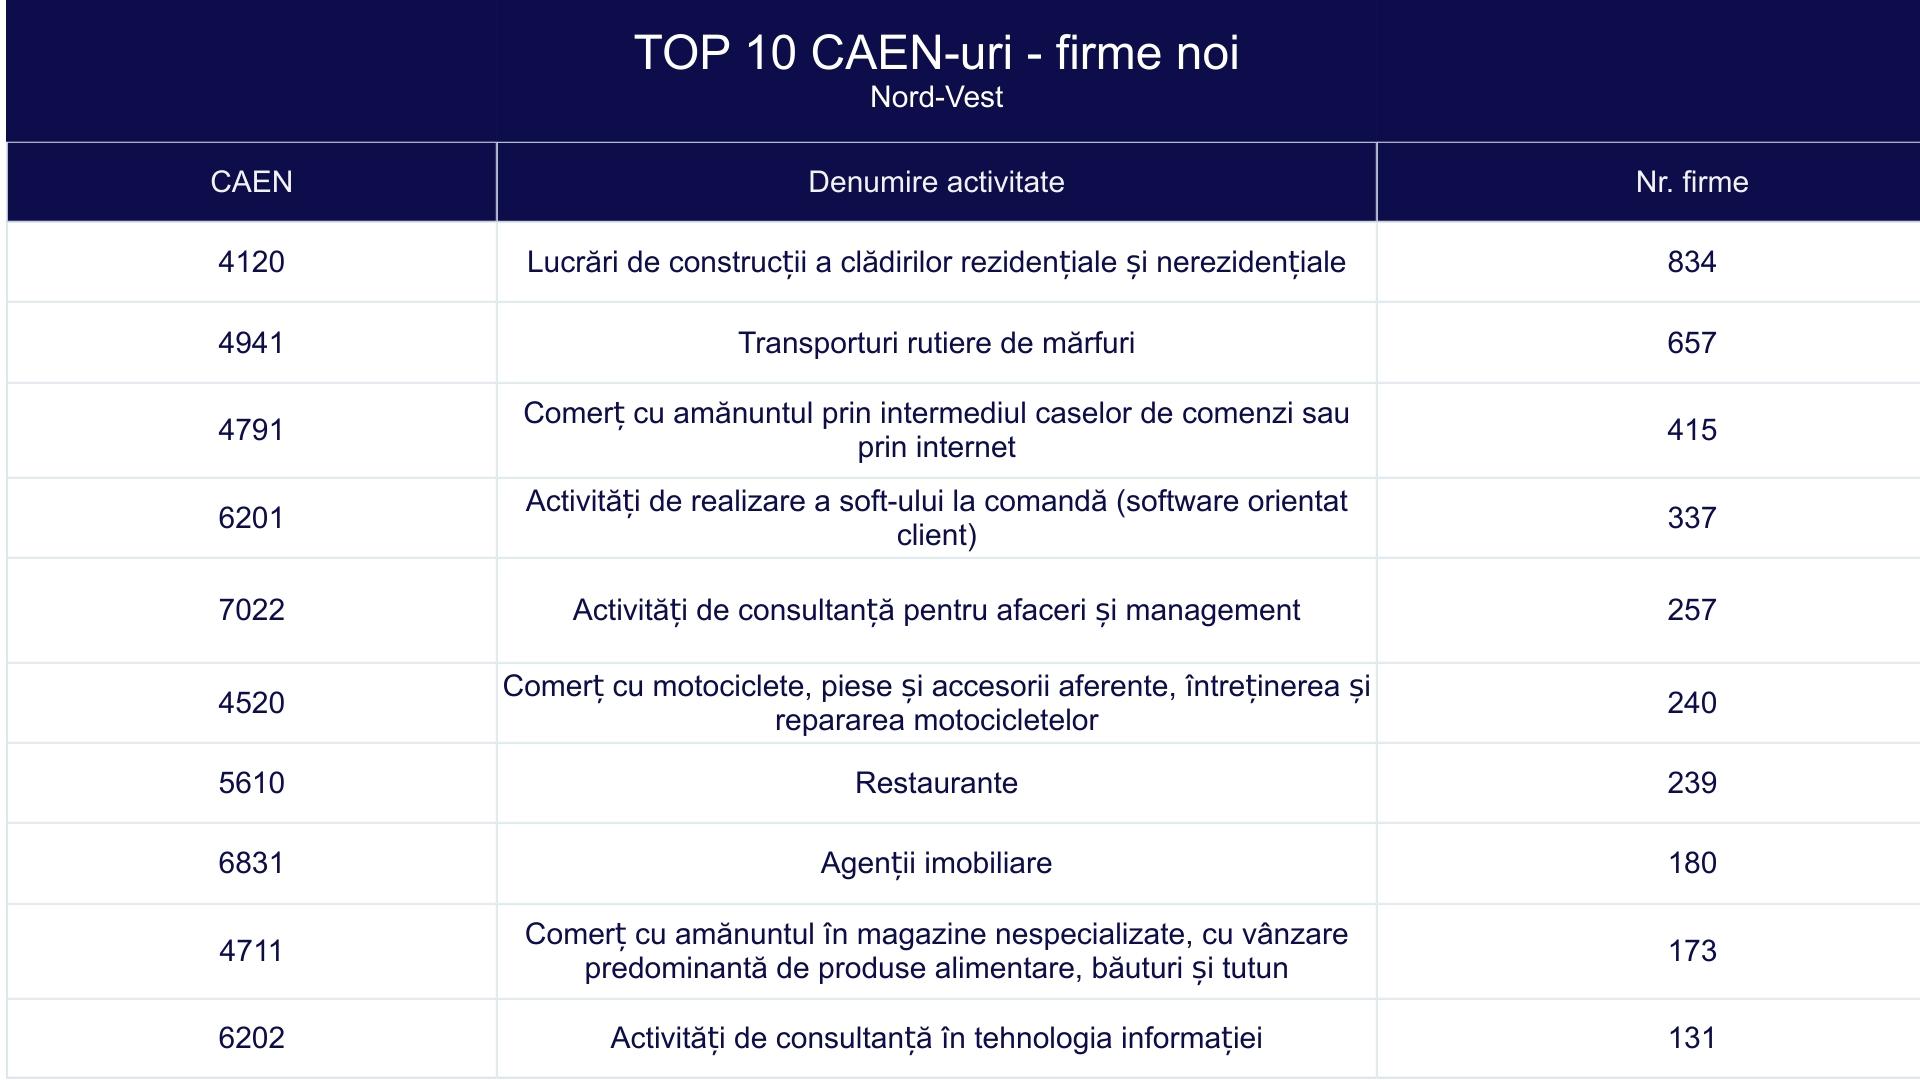 TOP 10 CAEN-uri - firme noi - Nord-Vest